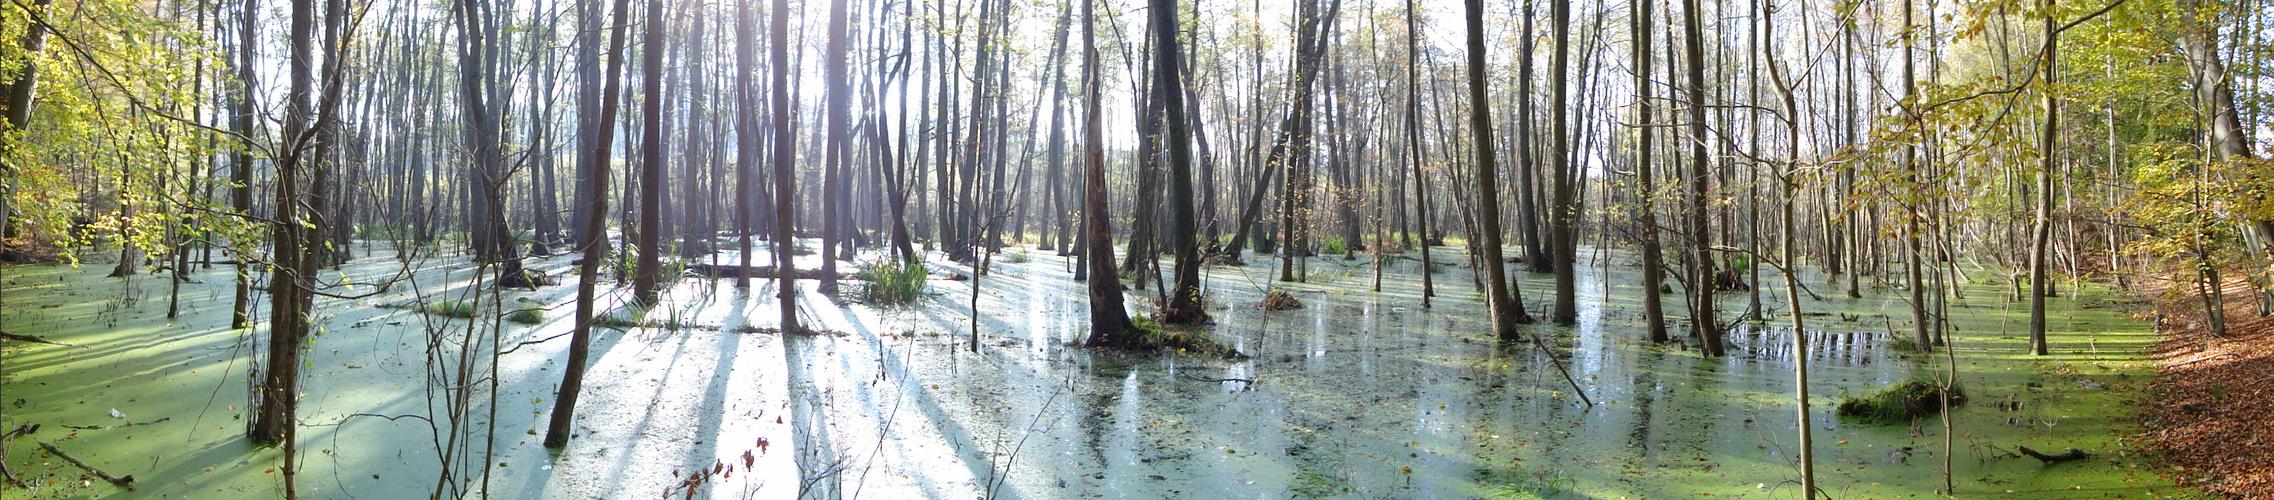 Sumpfgebiet...